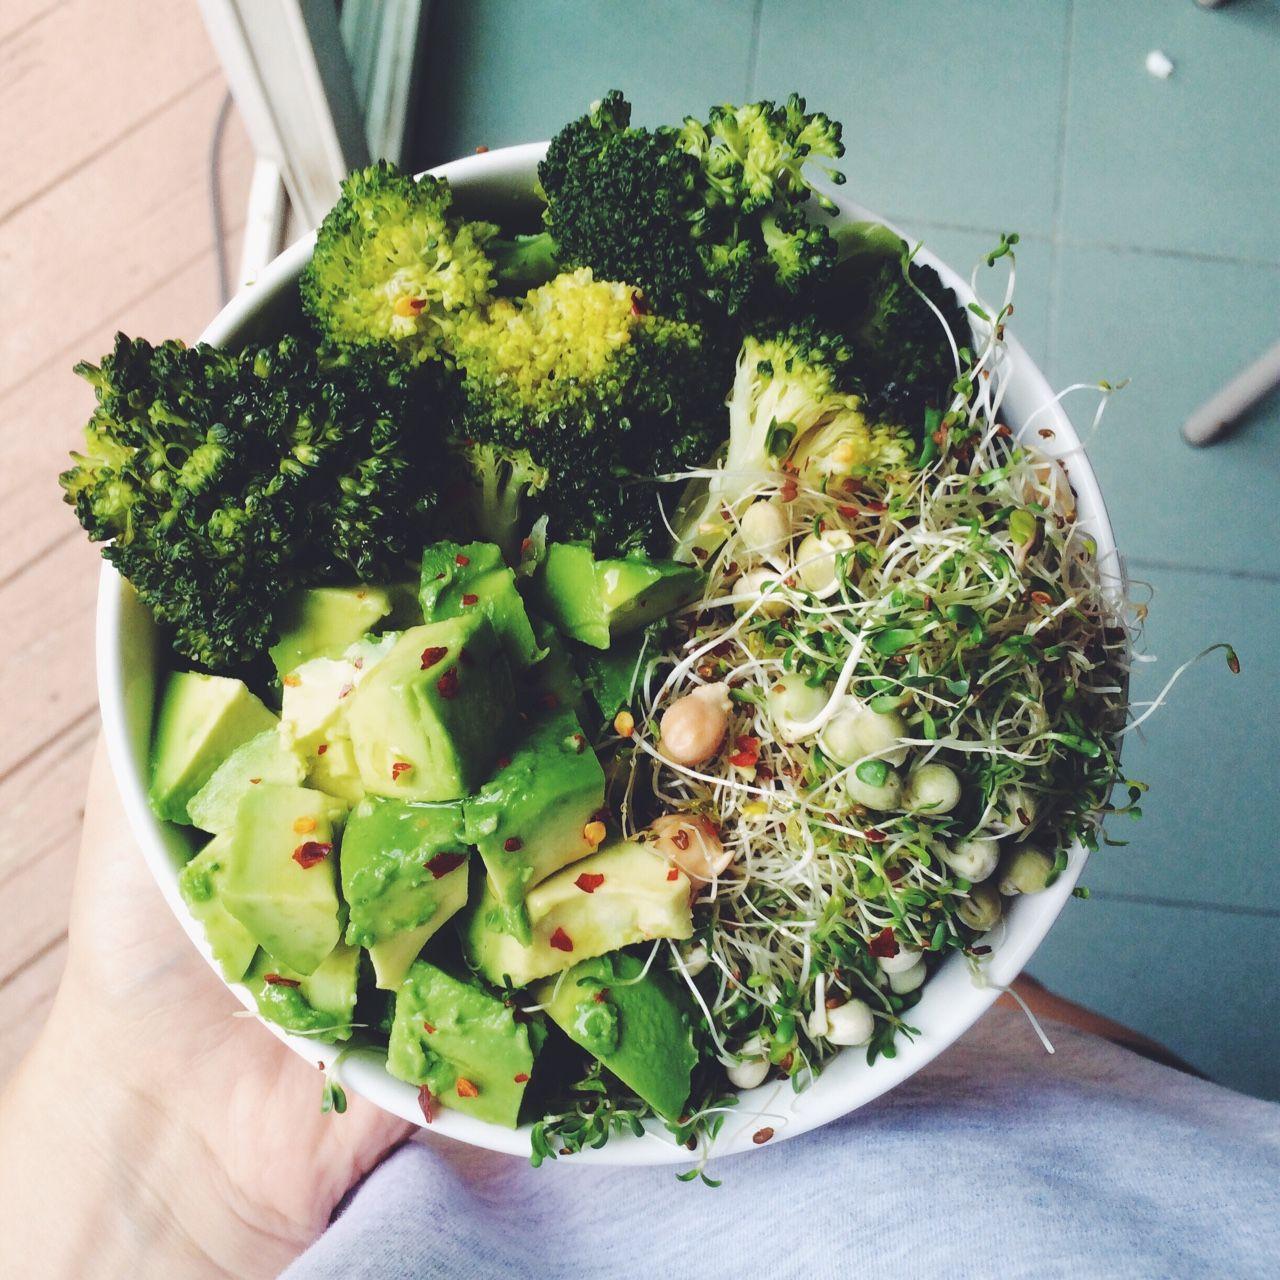 onehappyvegan:   Steamed broccoli, avocado, &... - The Black Workshop